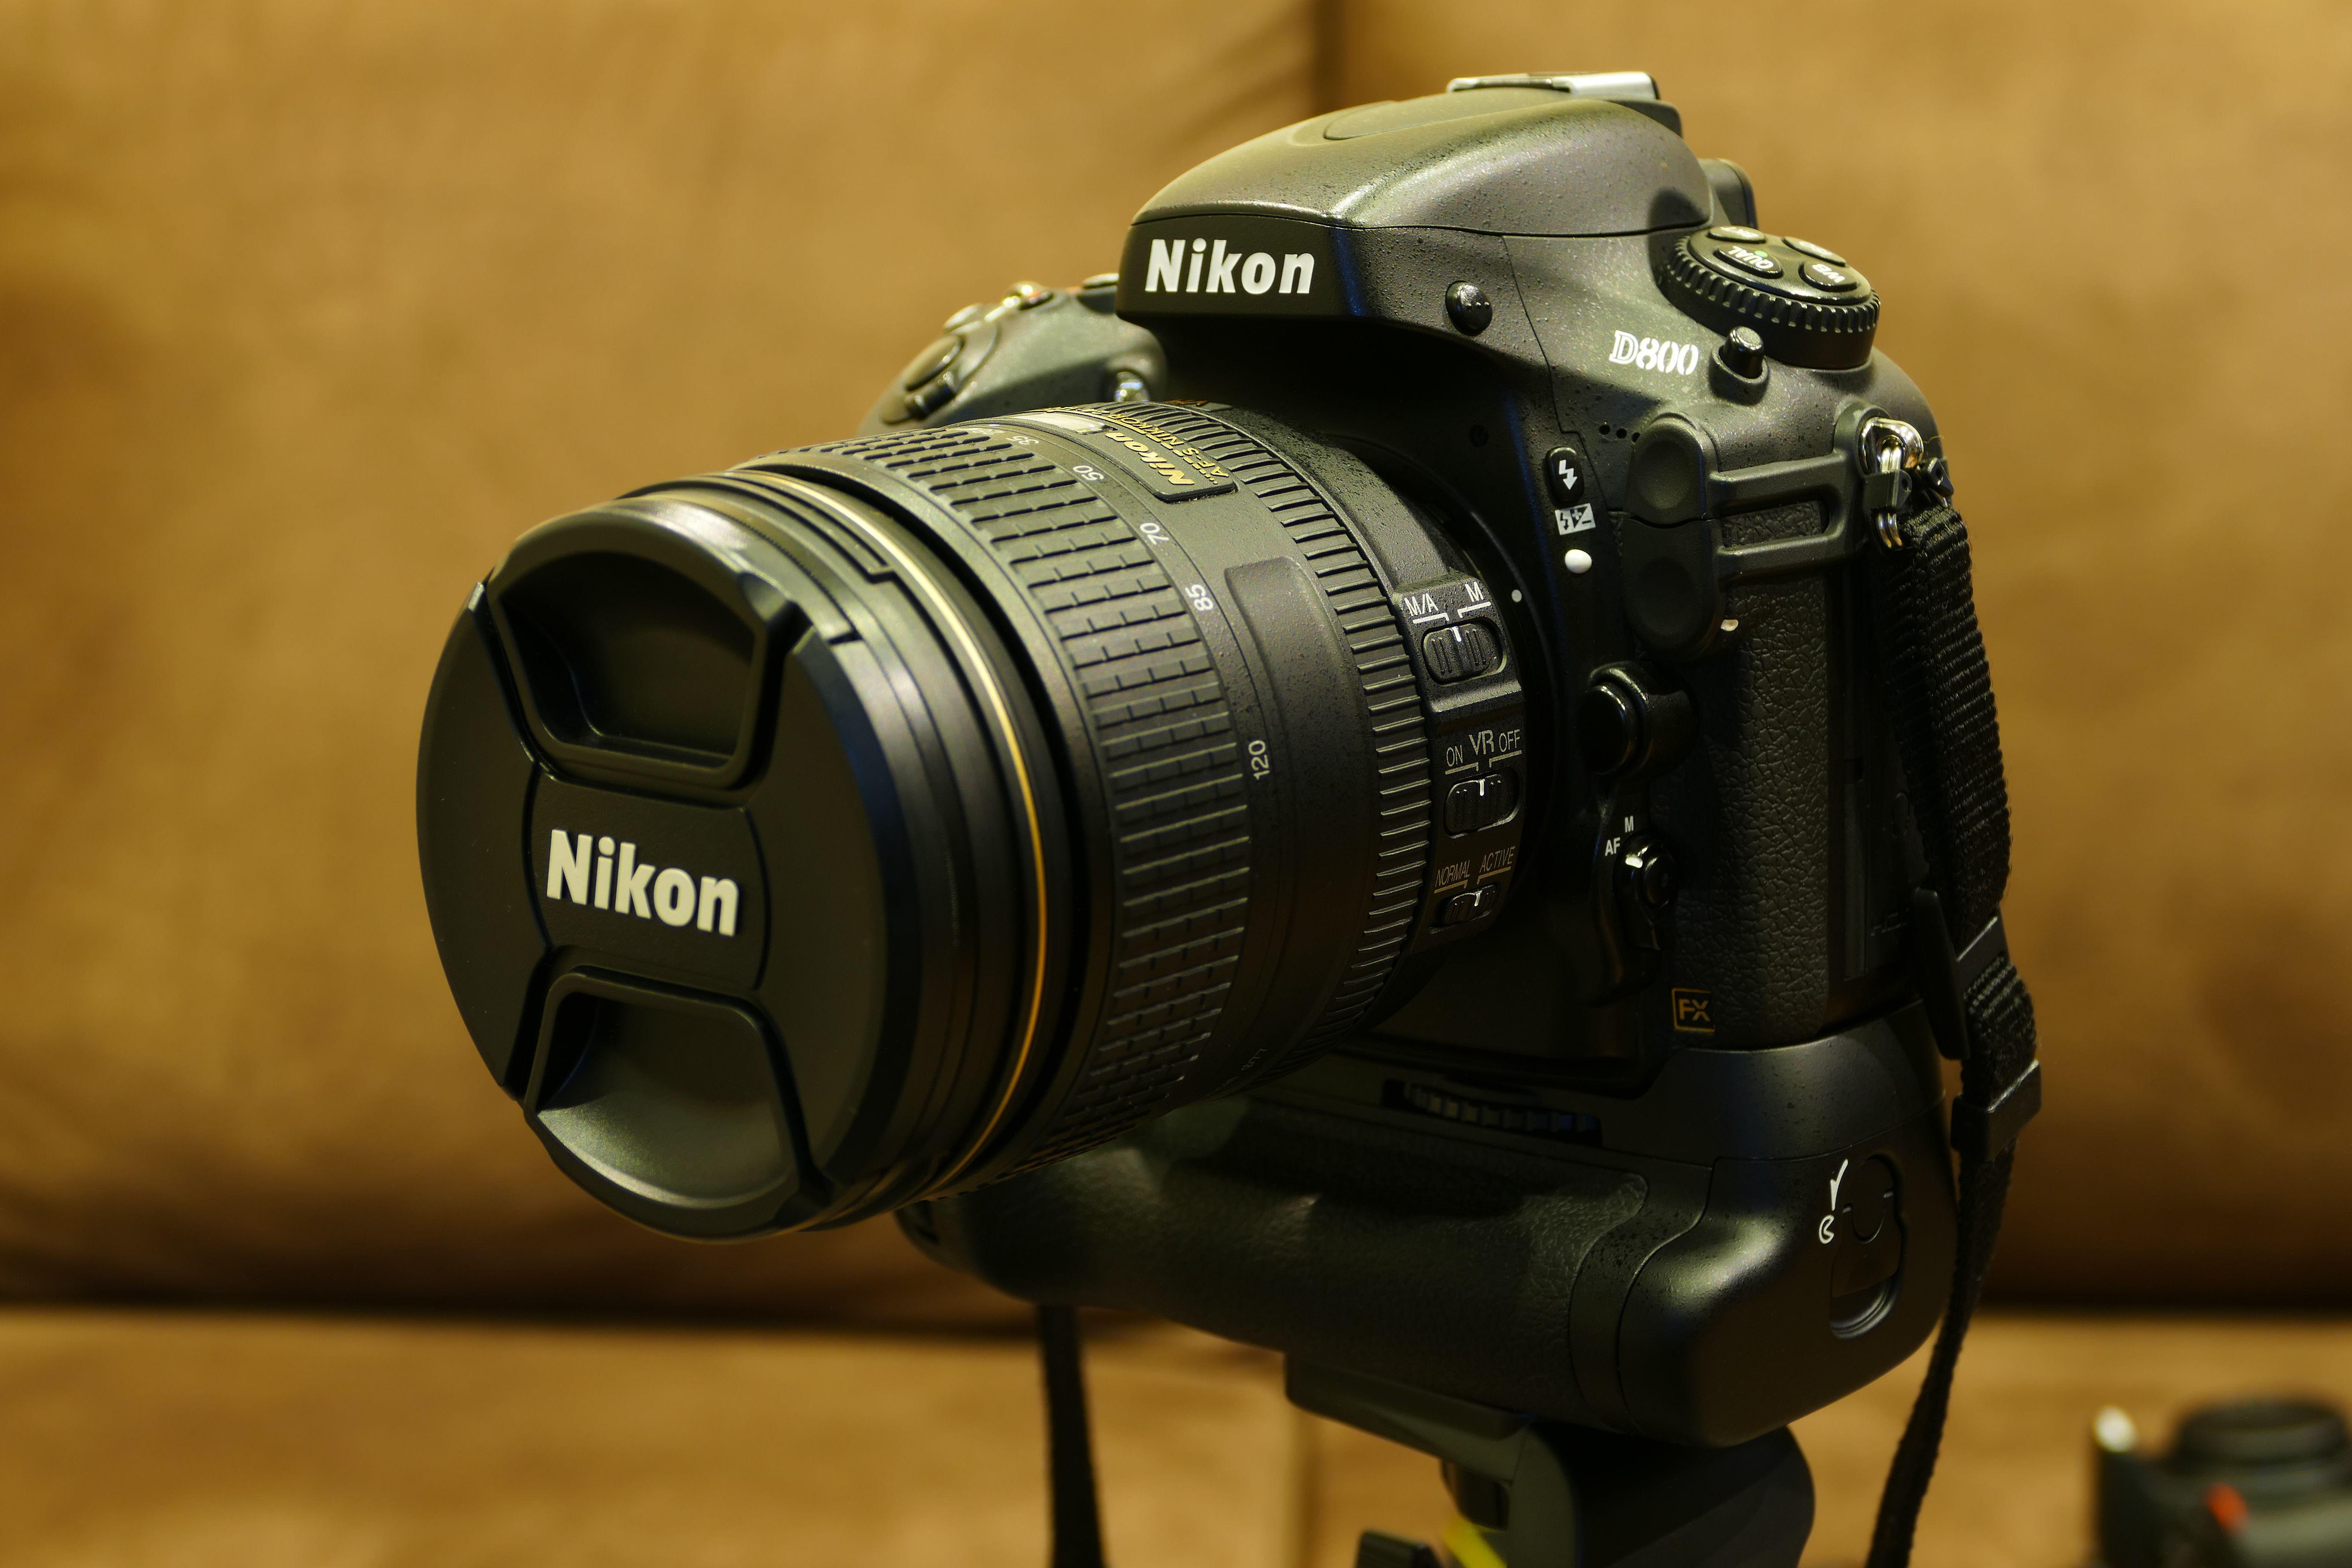 Nikon D800 Nikkor 24 120mm F4 Vr Closed Nikon D800 Nikon Camera Bag